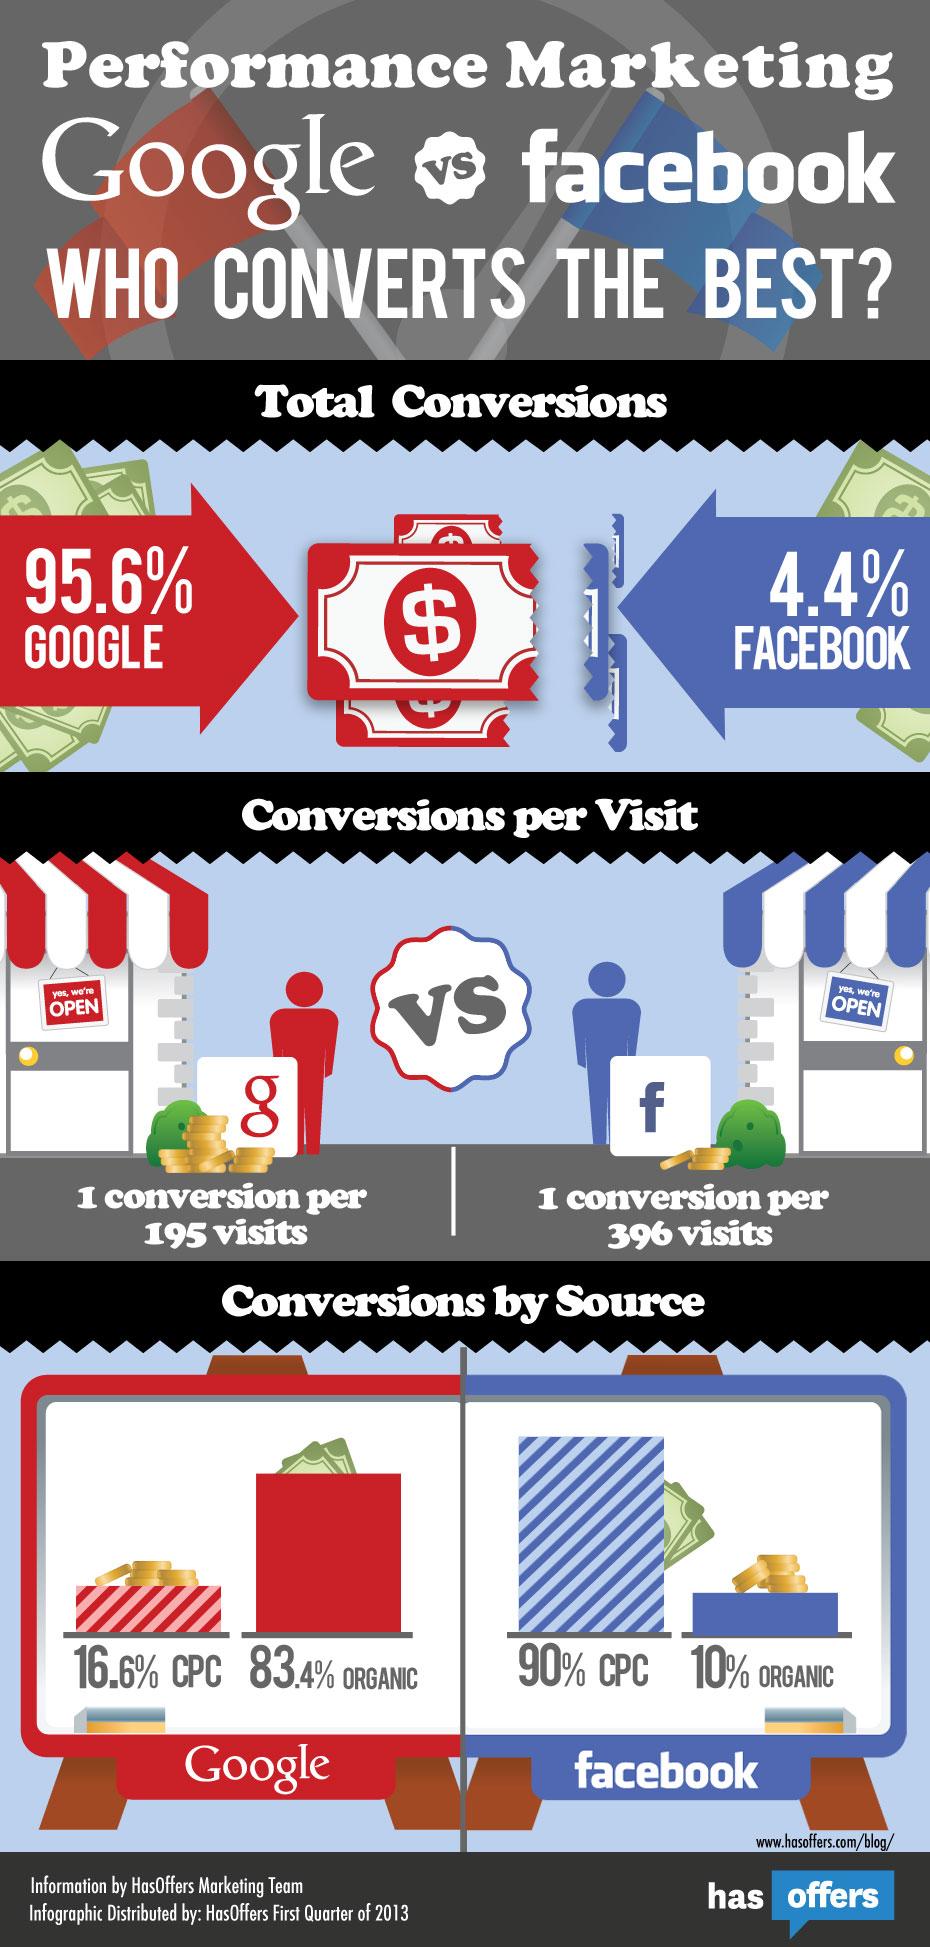 Facebook vs Google Trial Conversions